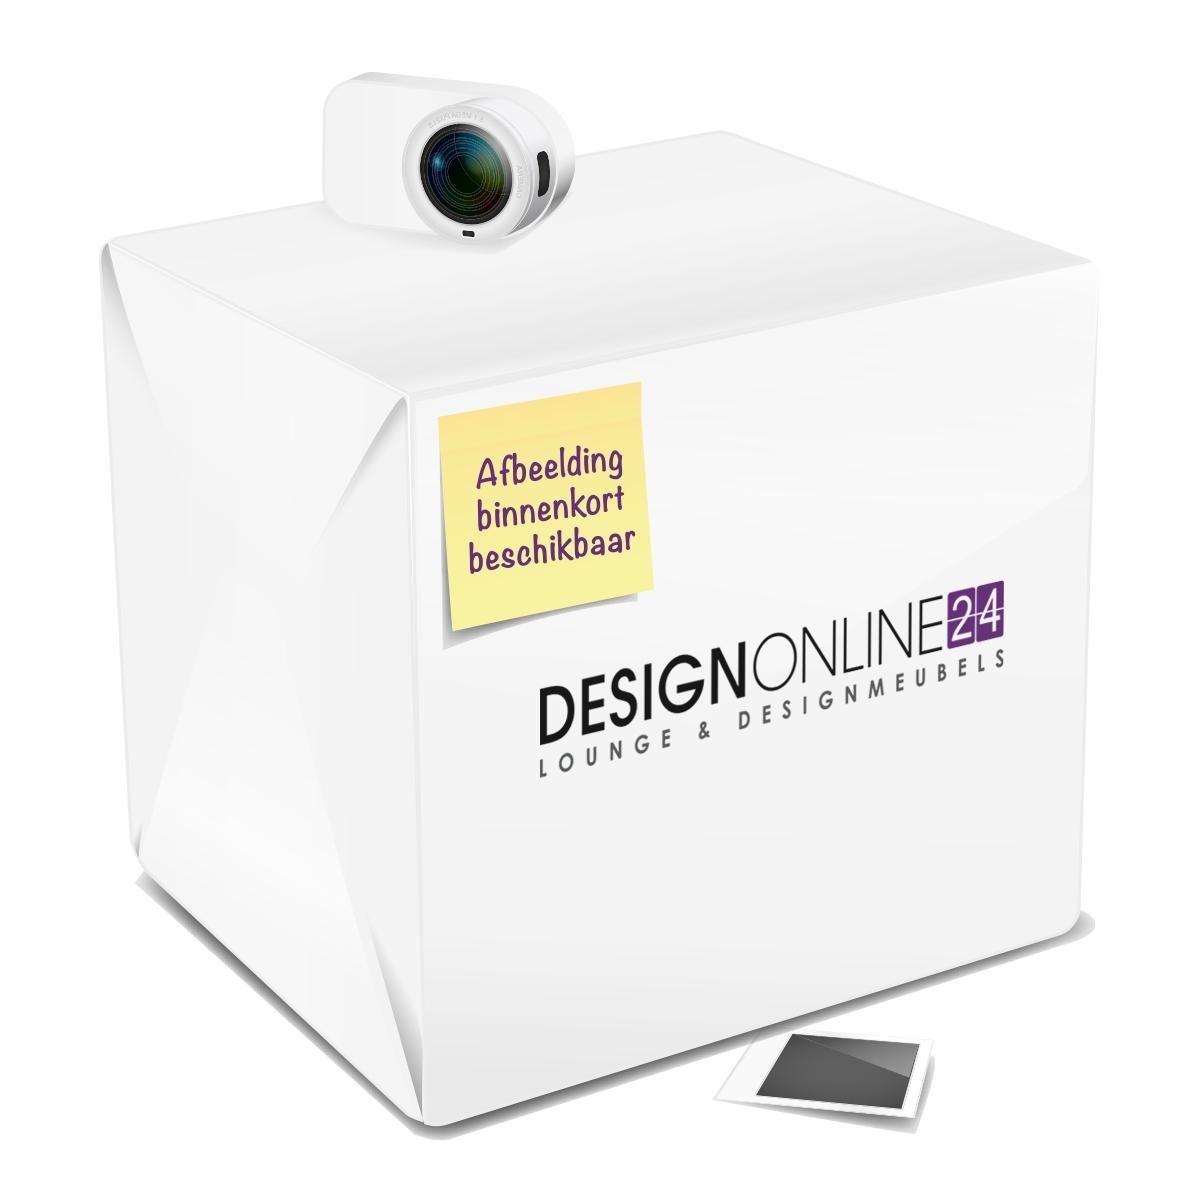 Innovation Slaapbank Cubed 90 Deluxe - Chromen Poten - Leatherlook 582 - Zwart